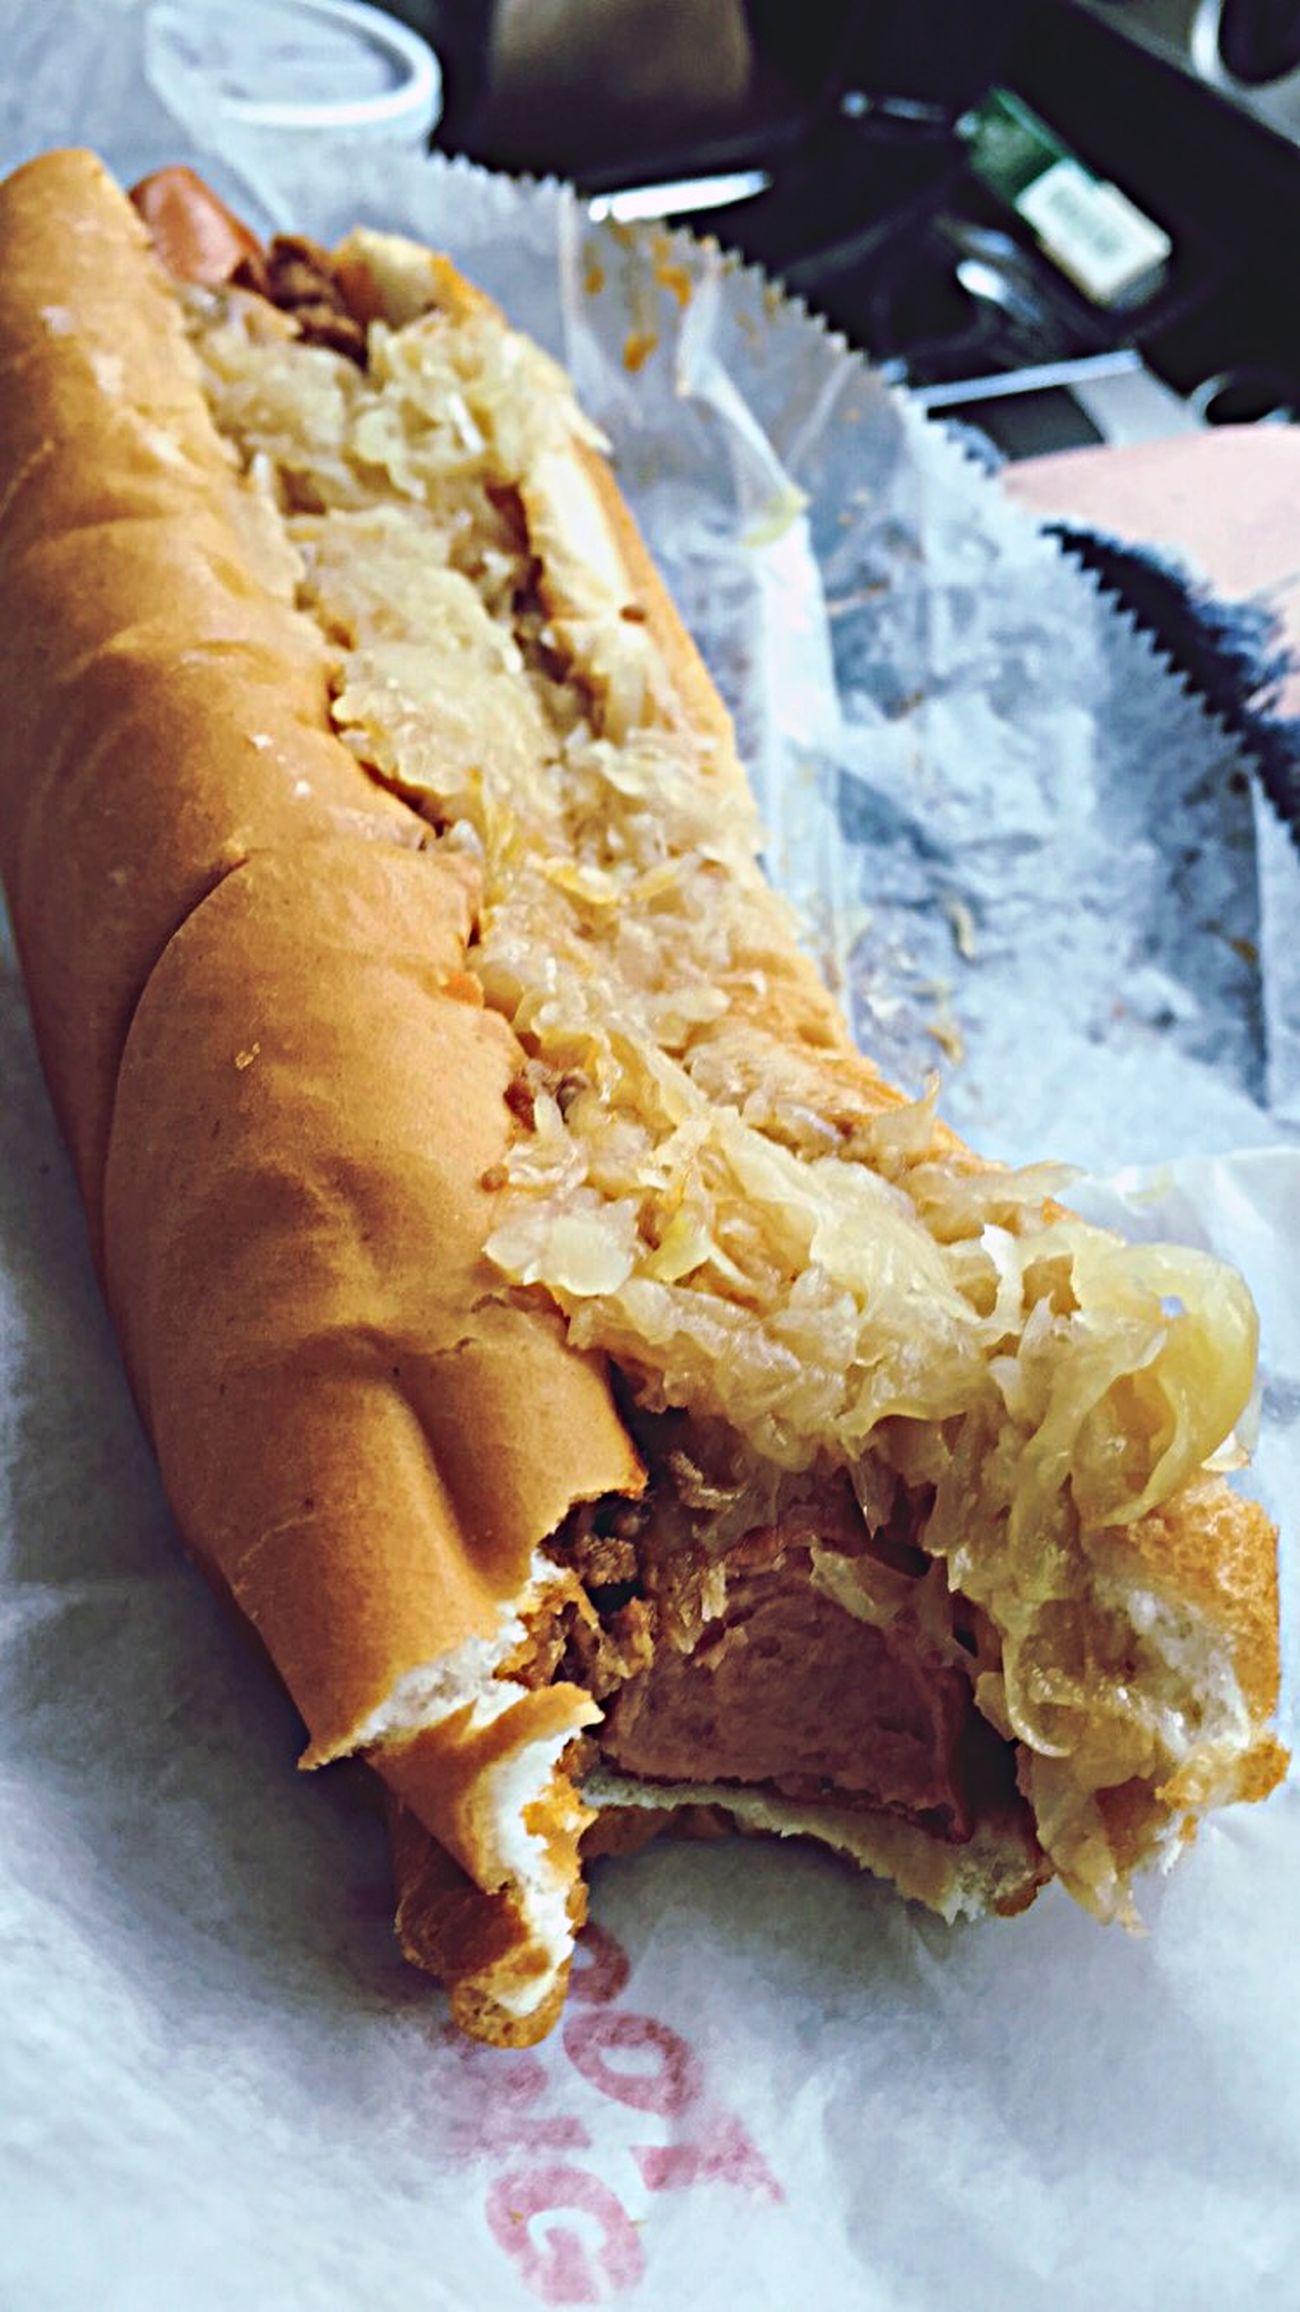 Footlong HotDog Food Foodphotography Ilovefood Sauerkraut Chili  Delicious